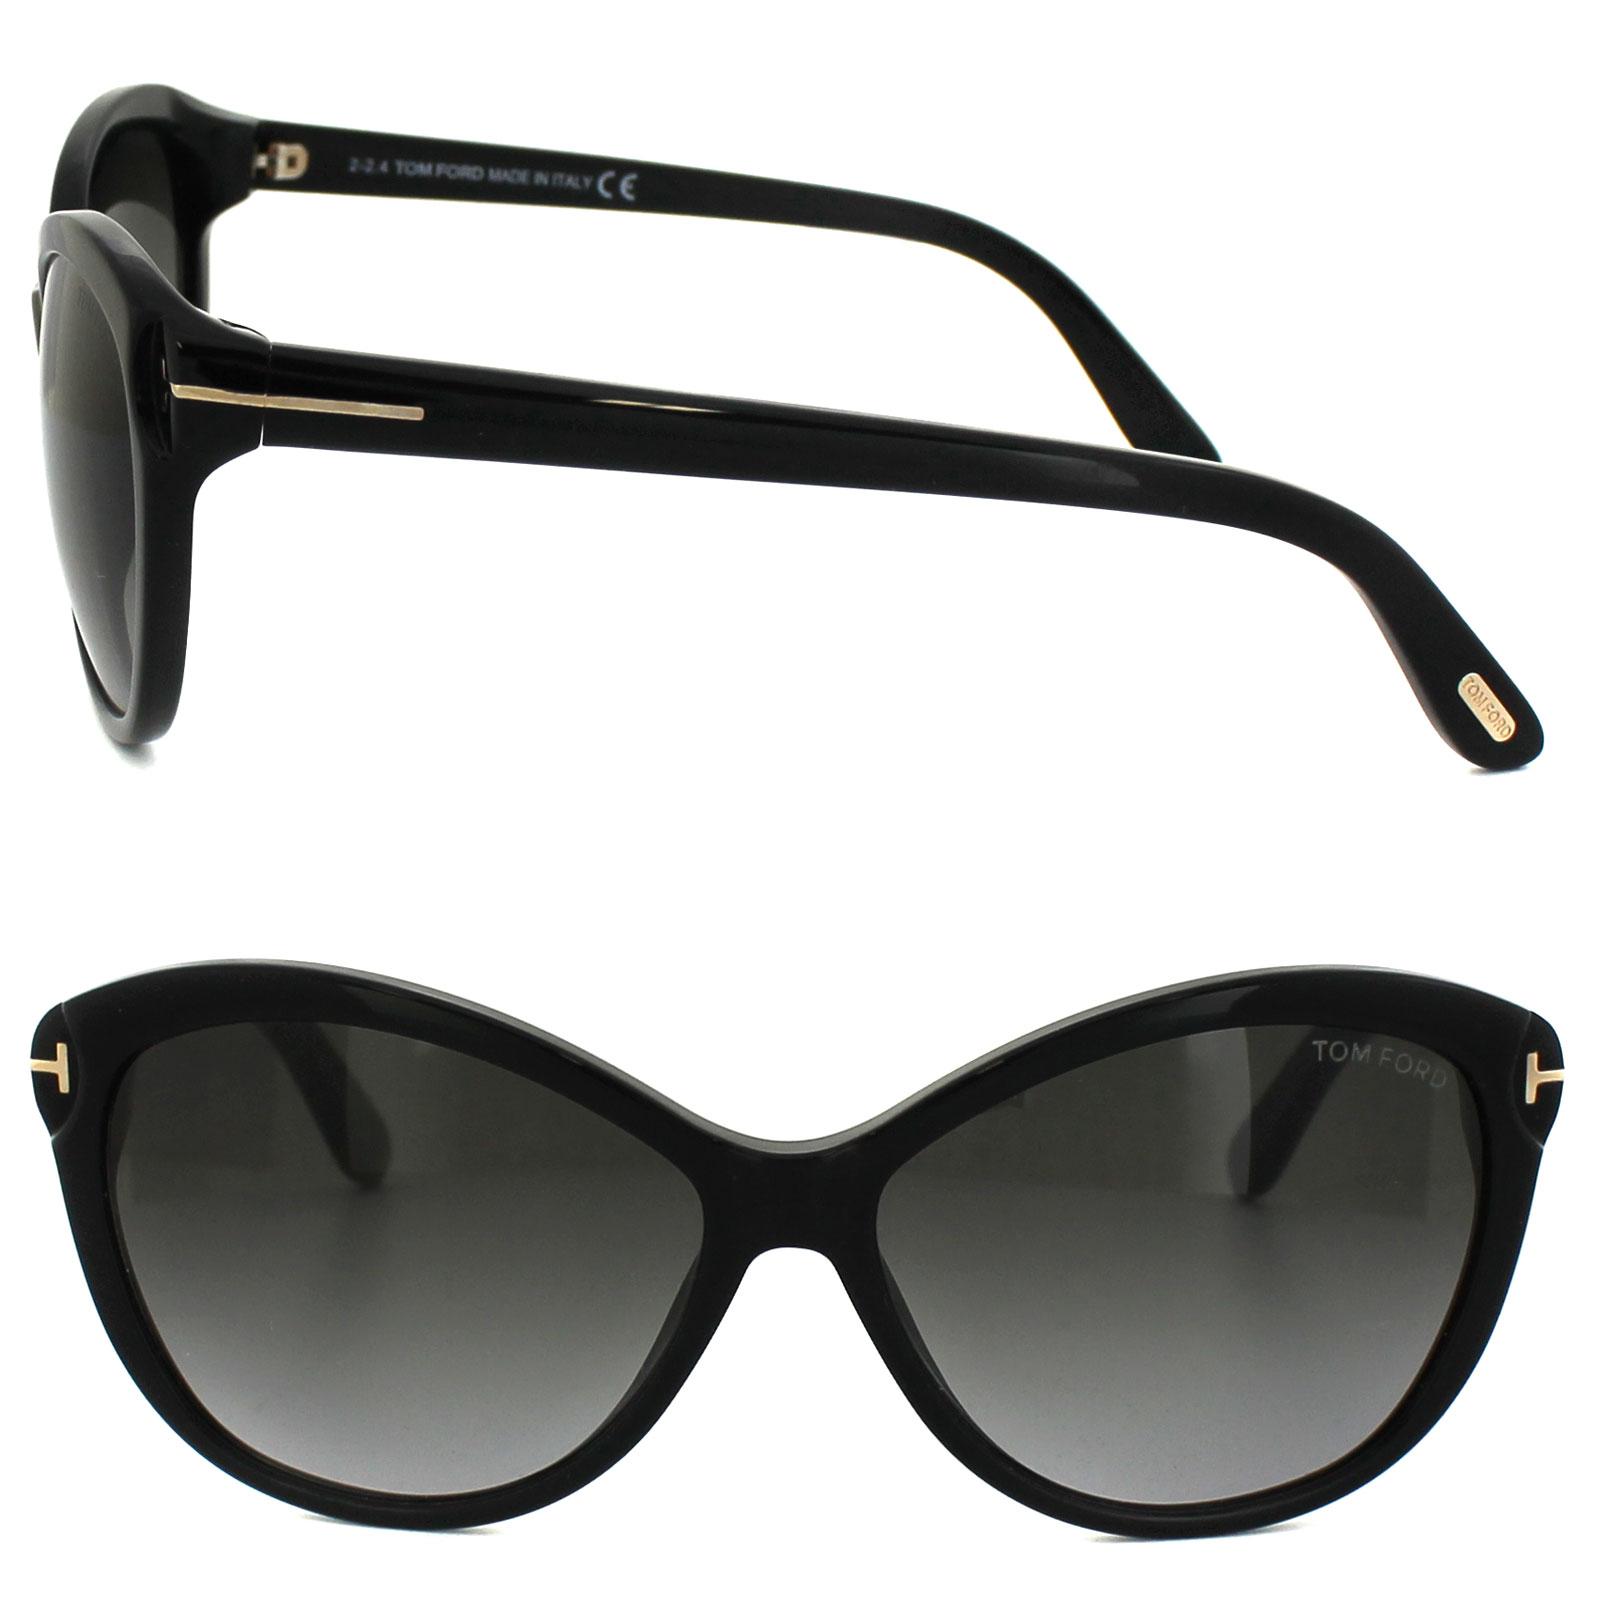 cd8a752751 Sentinel Tom Ford Sunglasses 0325 Telma 01P Shiny Black Green Gradient